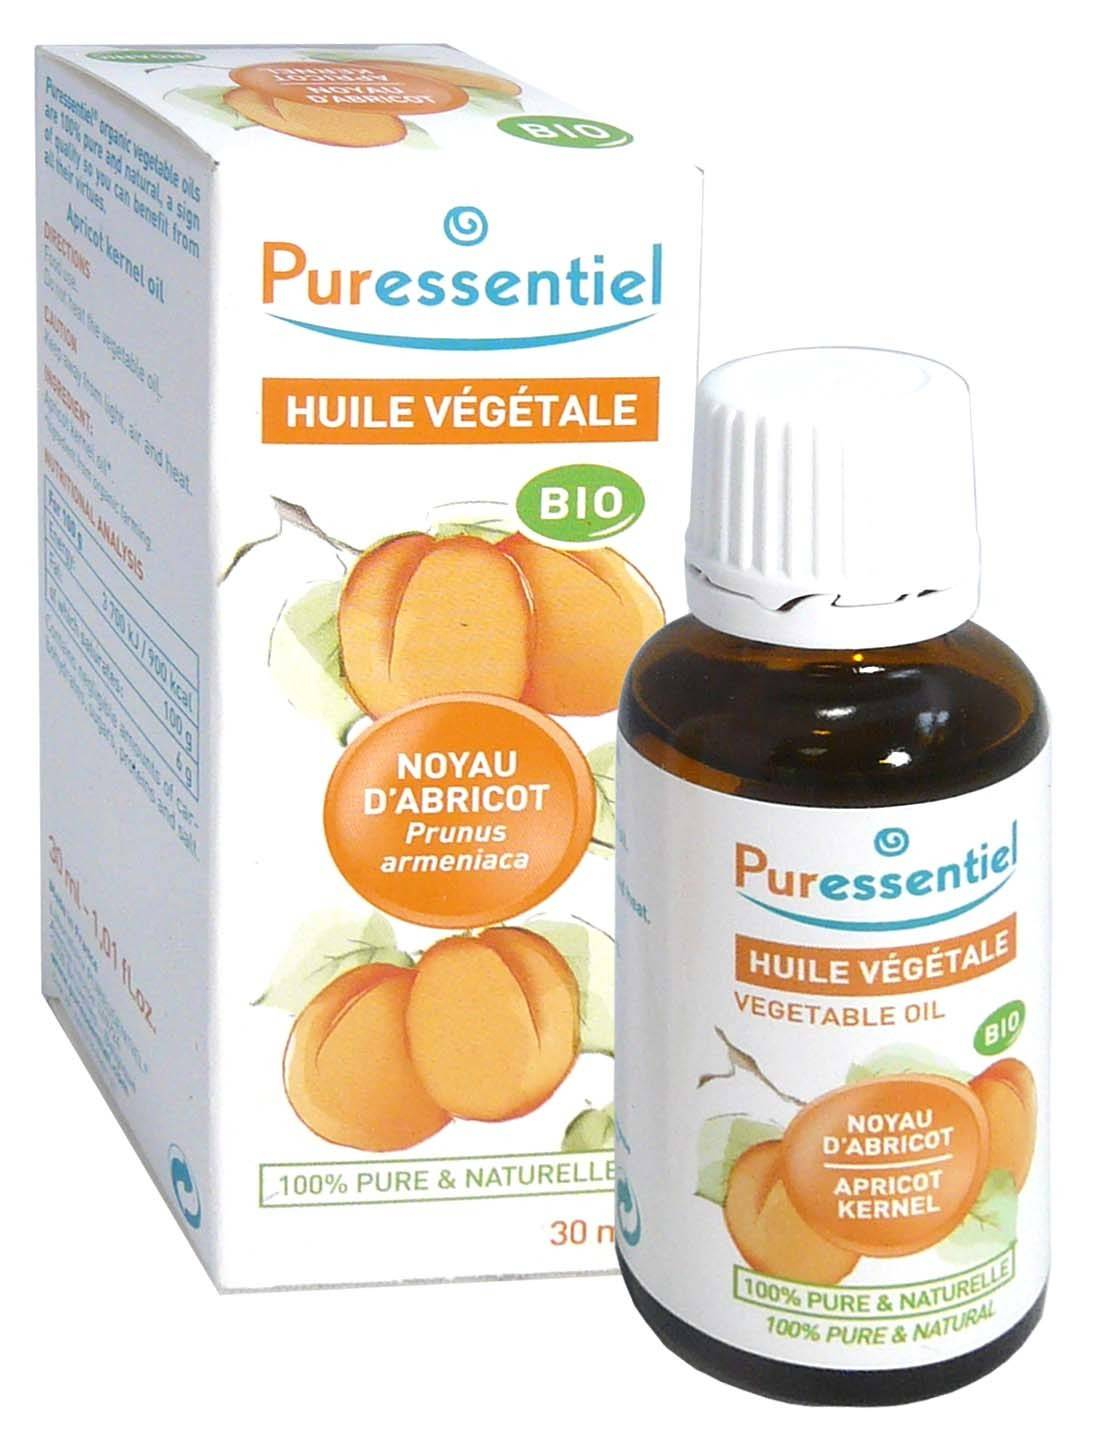 Puressentiel huile vegetale bio noyau d'abricot 30ml